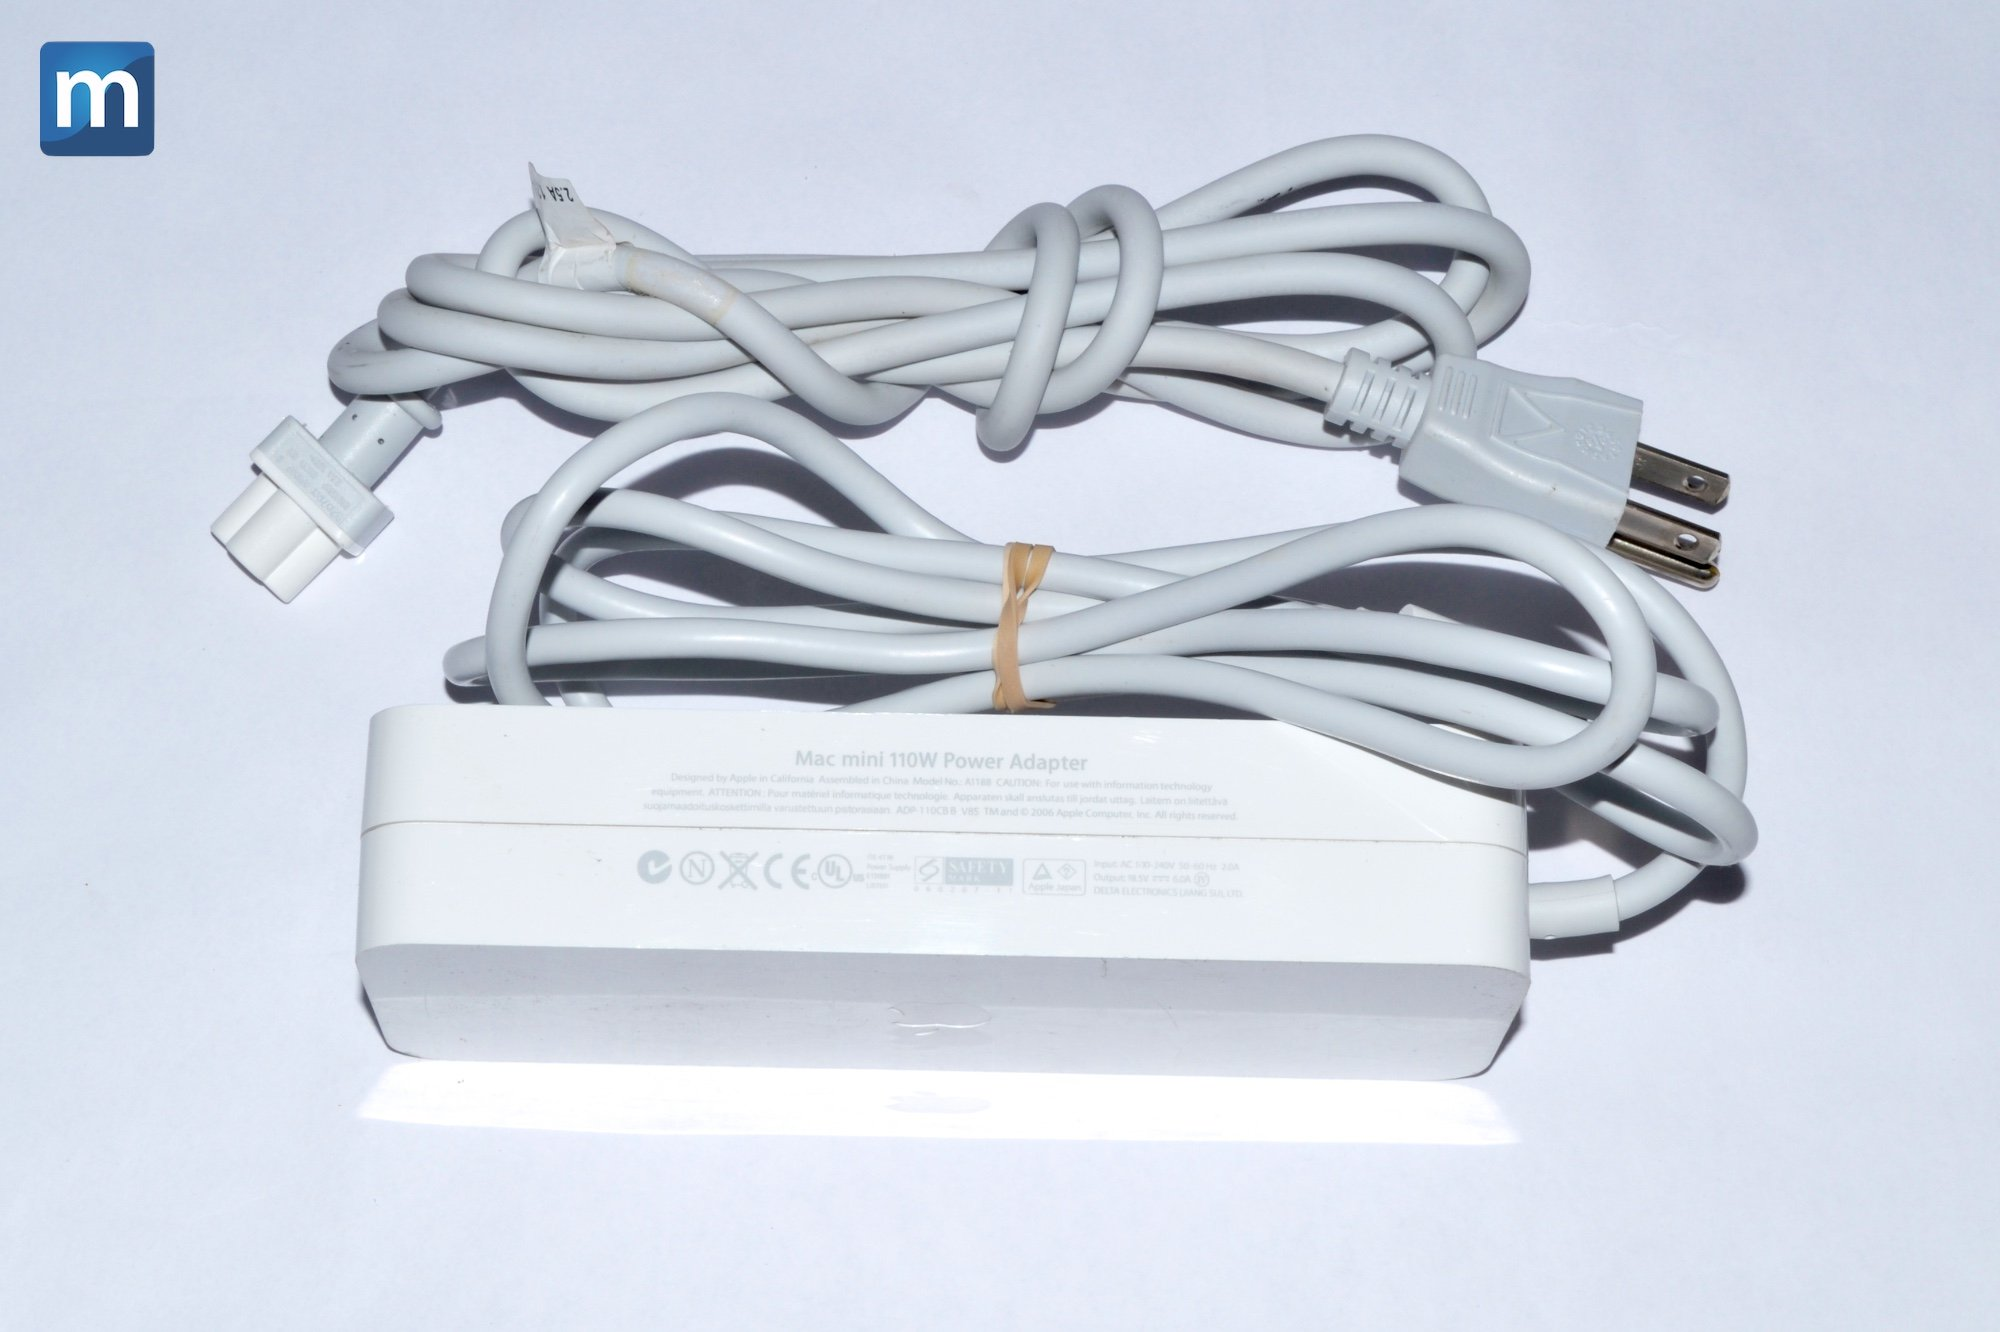 APPLE A1188 18.5V 6.0A 110 WATTS POWER SUPPLY FOR MAC MINI